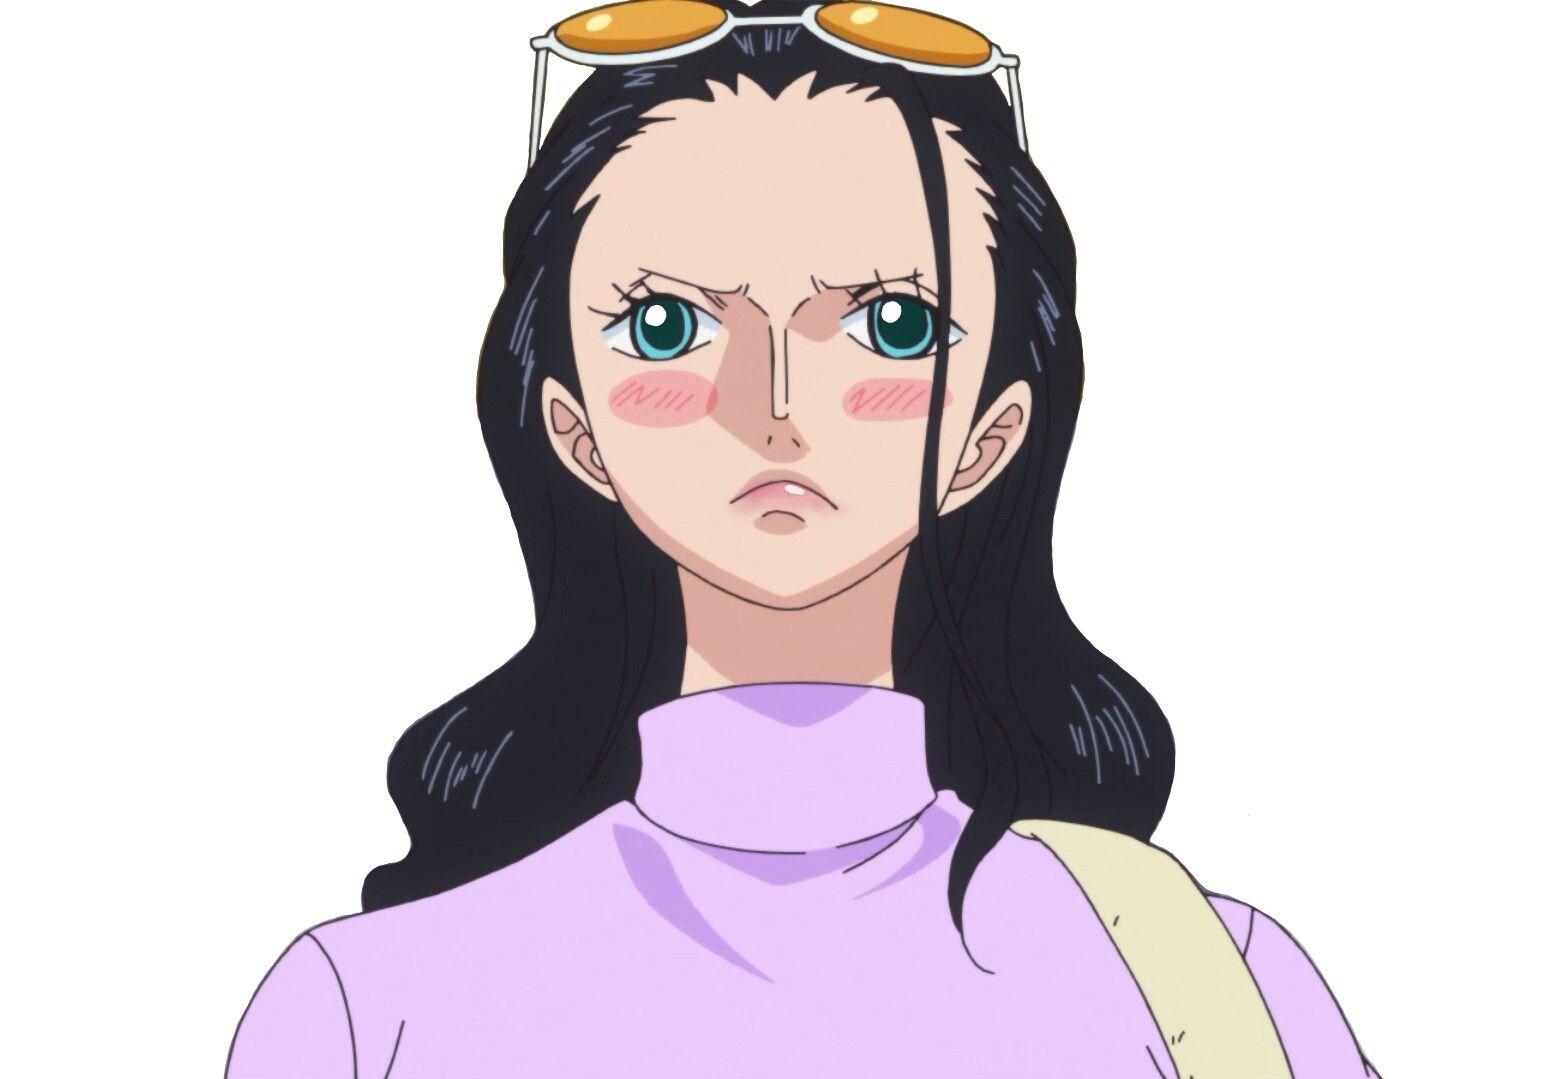 OnePiece - Nico Robin